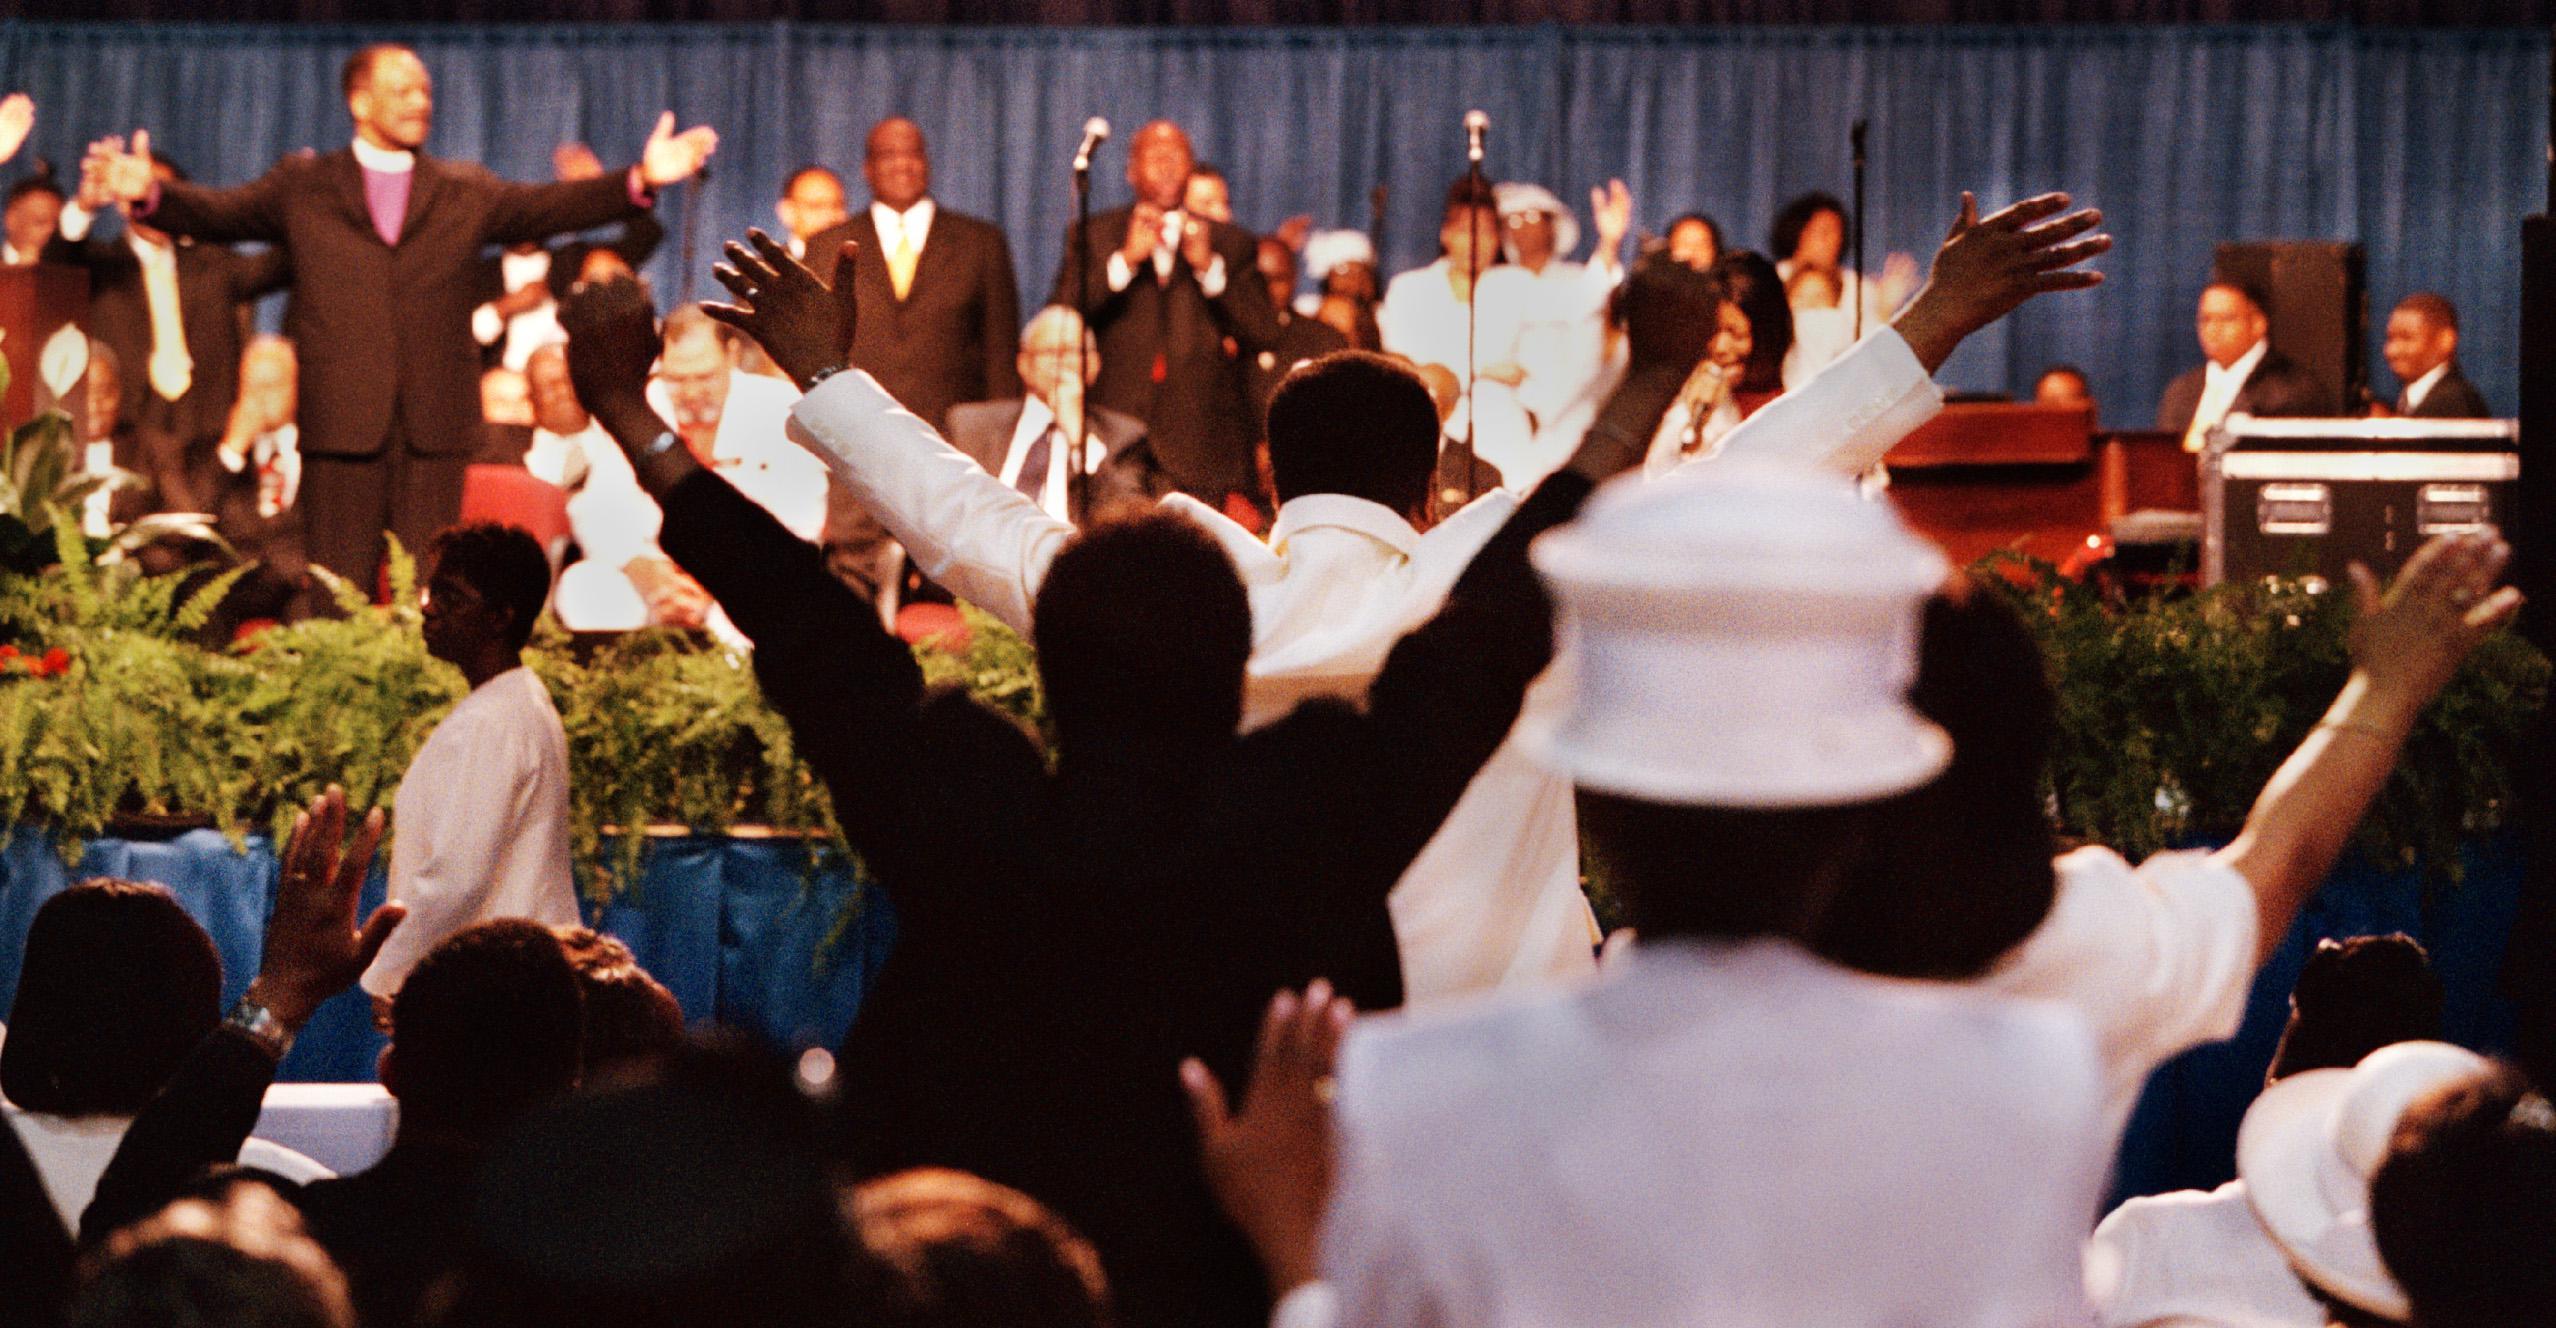 rp/pentecostal 07/31/2002 Jahi Chikwendiu/TWP People from ar